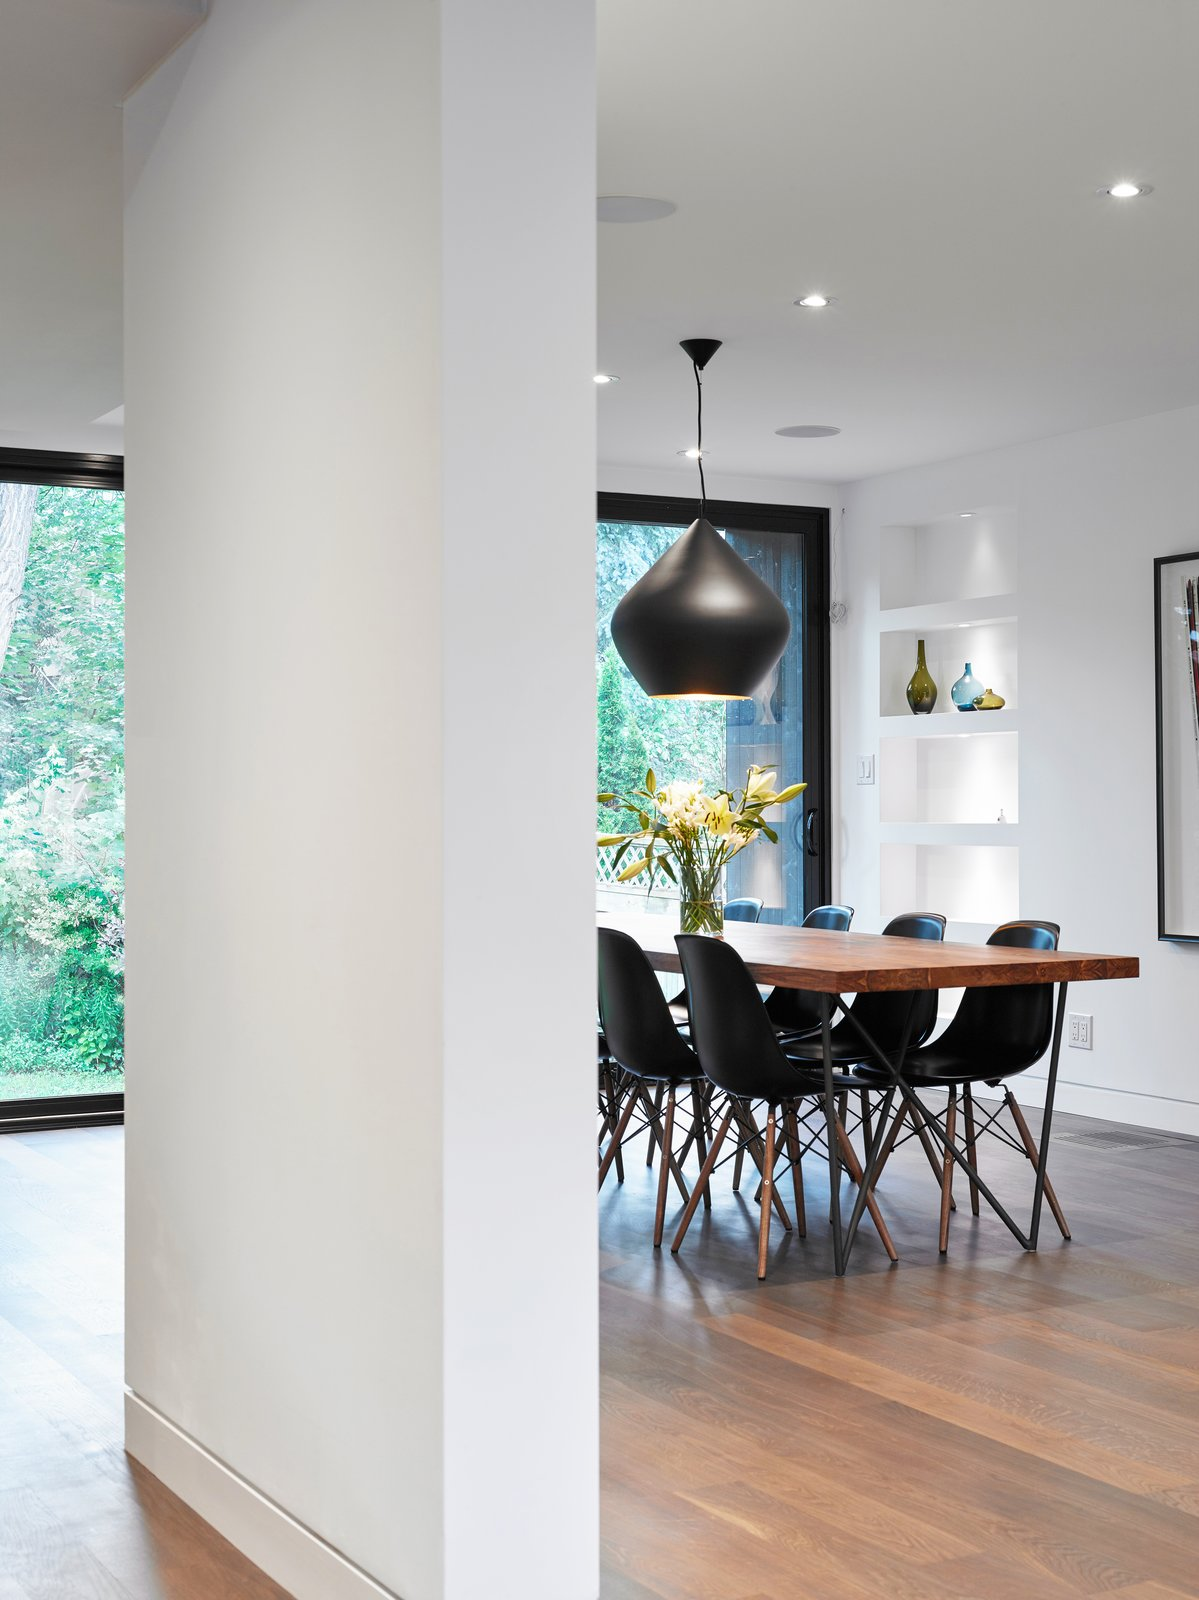 Dining Room, Recessed Lighting, Chair, Pendant Lighting, Shelves, Table, and Medium Hardwood Floor  Hibou House by Barbora Vokac Taylor Architect